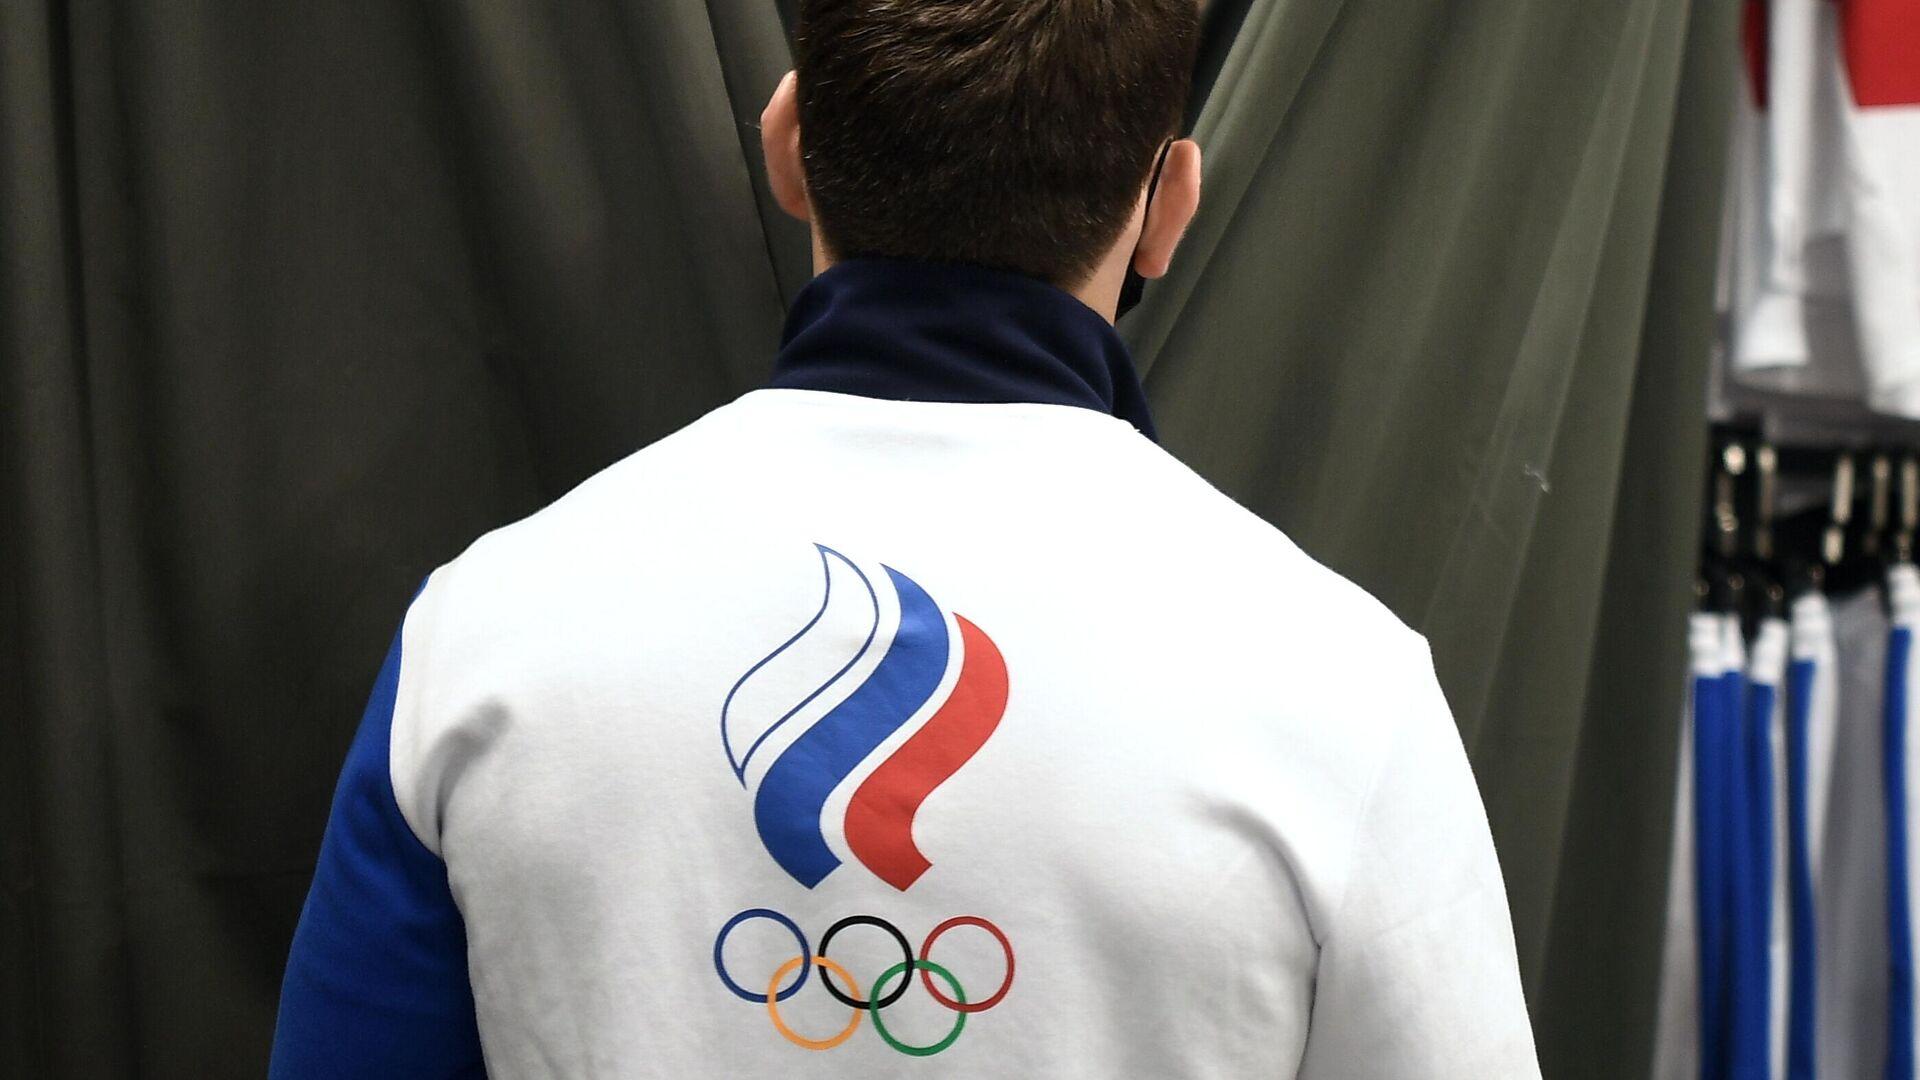 La selección rusa de los JJOO de Tokio 2020 - Sputnik Mundo, 1920, 06.07.2021